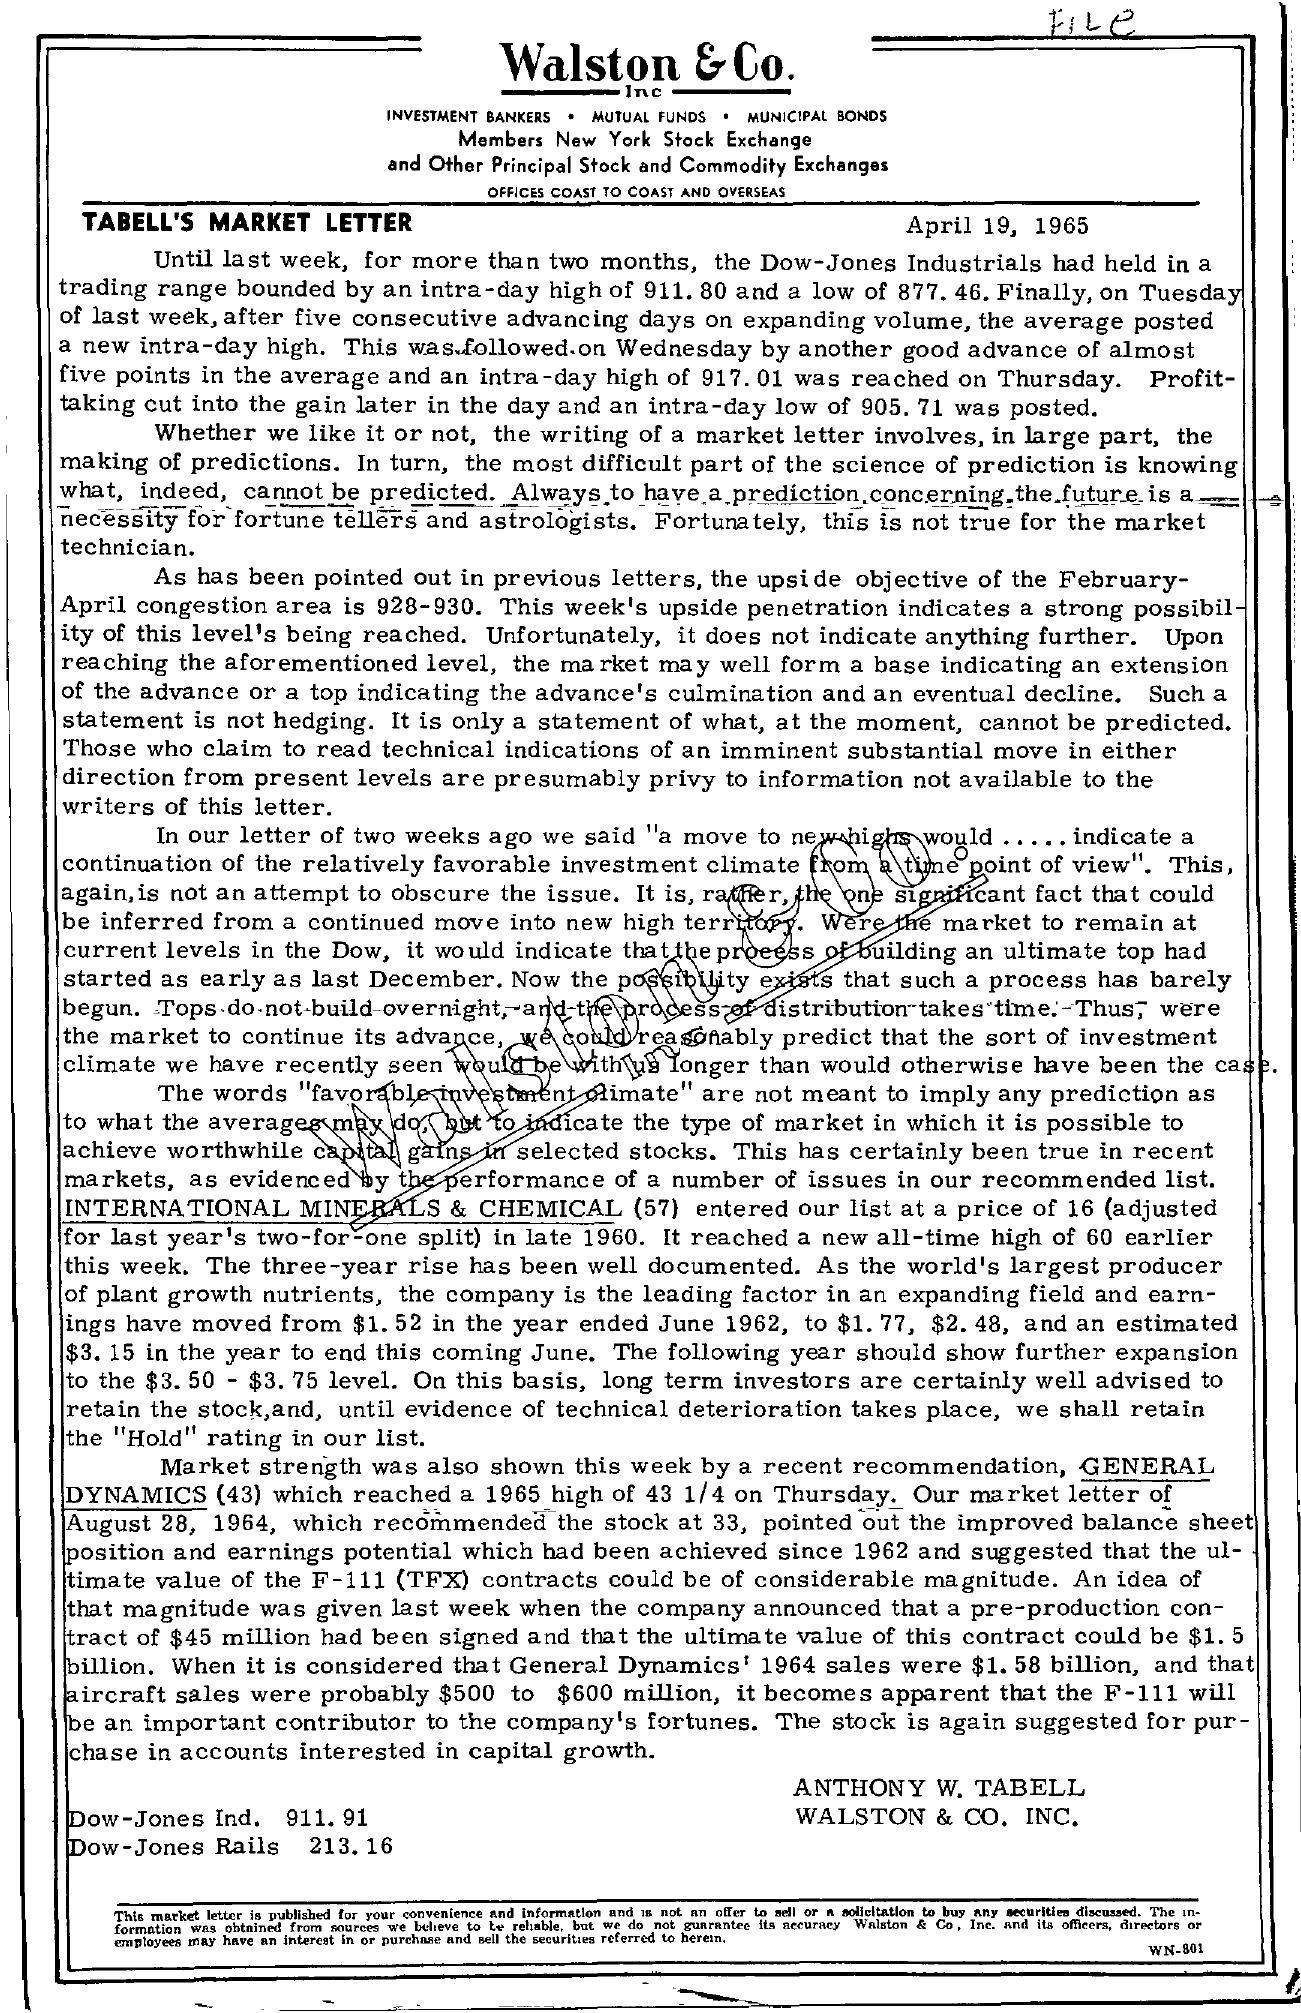 Tabell's Market Letter - April 19, 1965